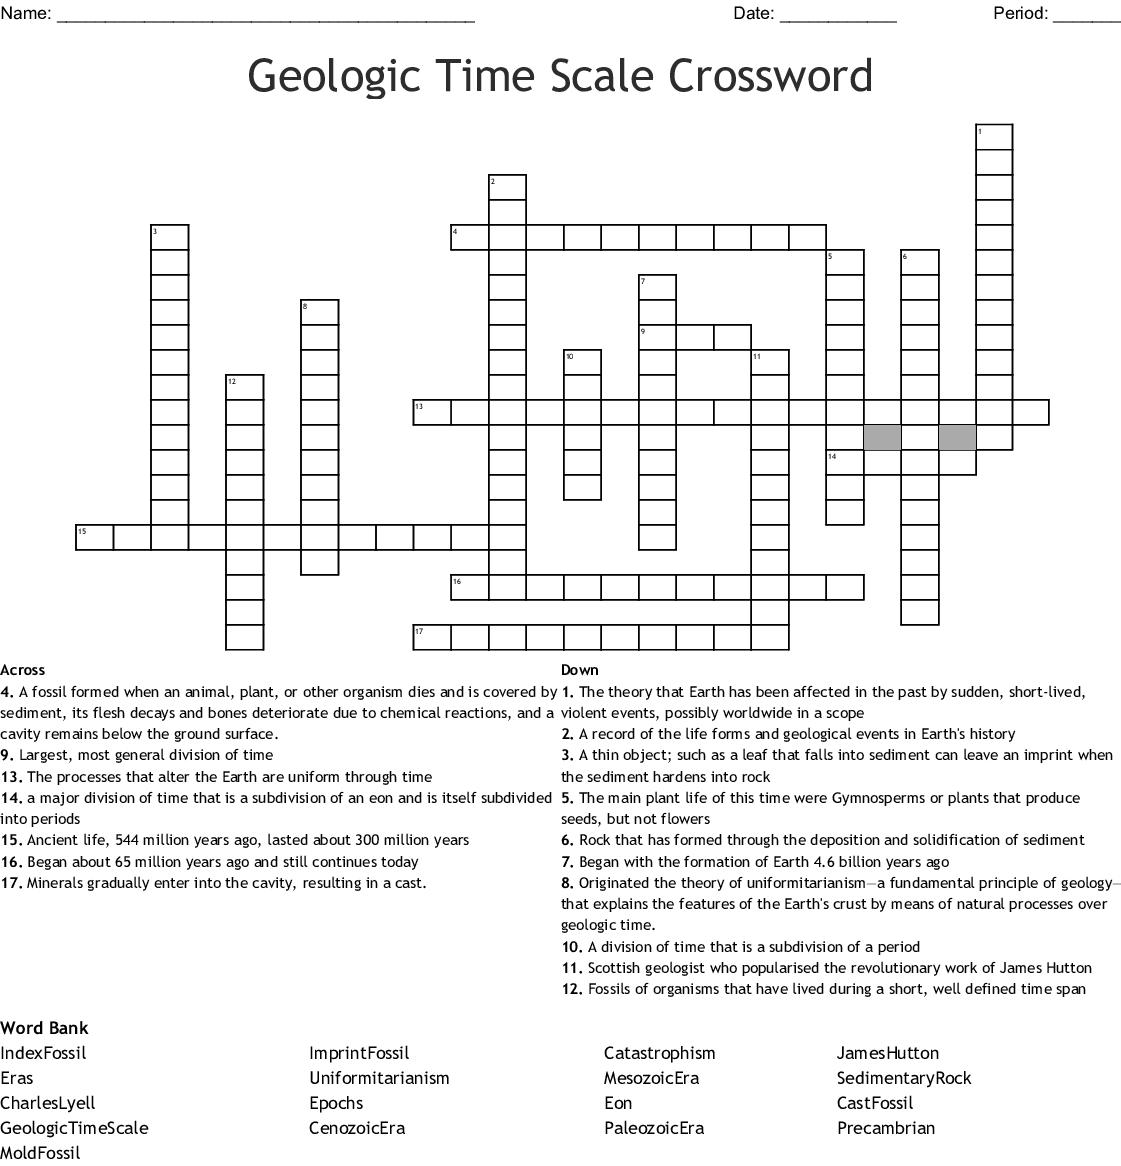 Geologic Time Scale Crossword